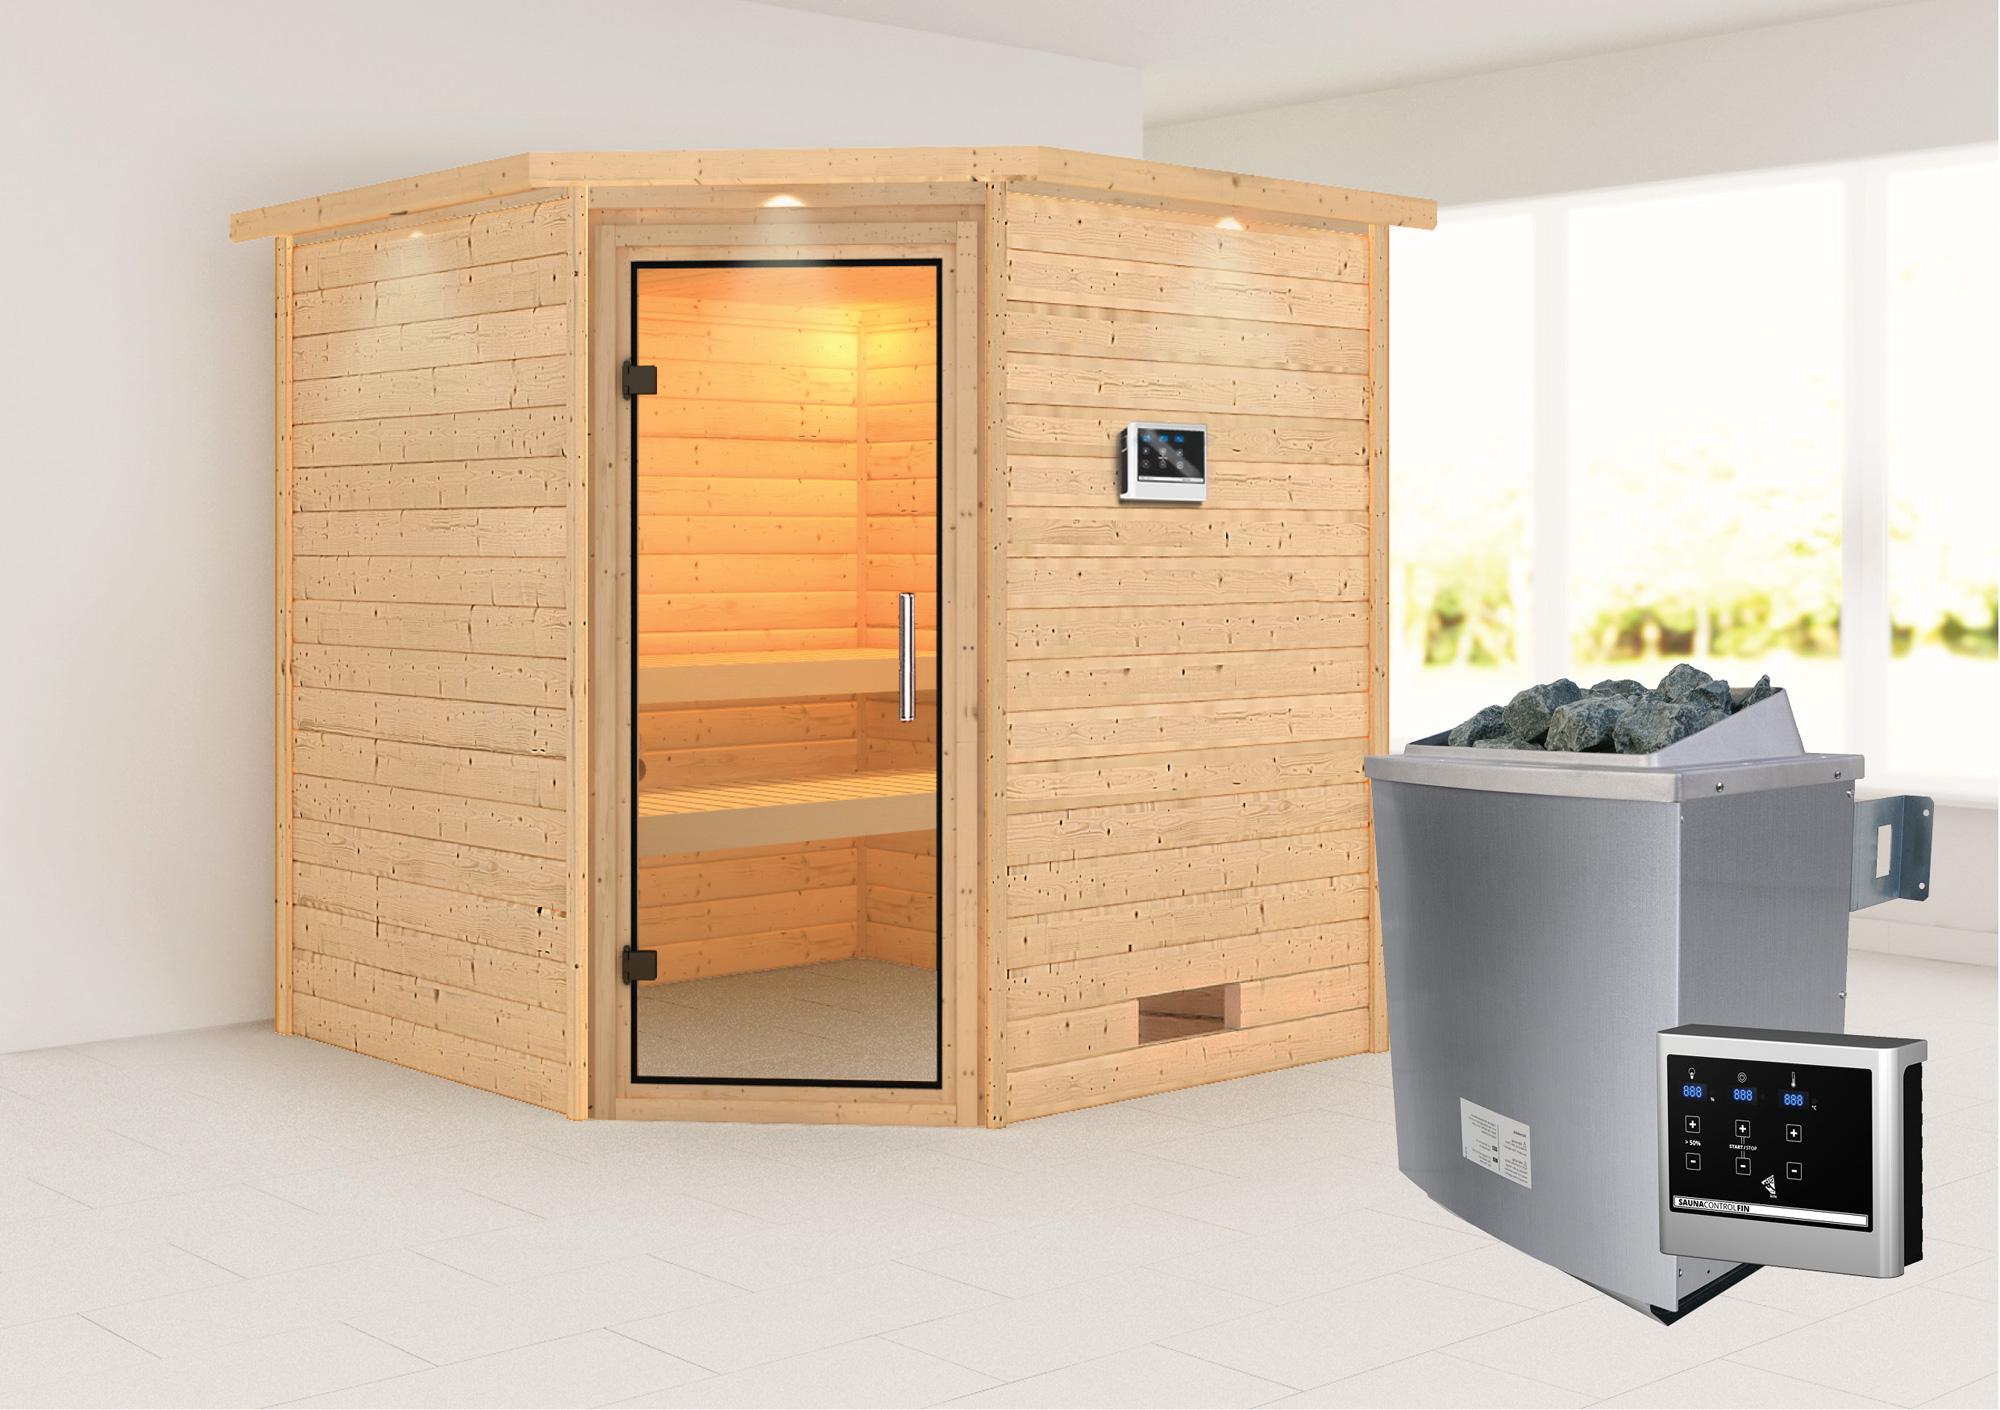 WoodFeeling Sauna Nina 38mm Saunaofen 9kW extern Kranz Klarglas Tür Bild 1